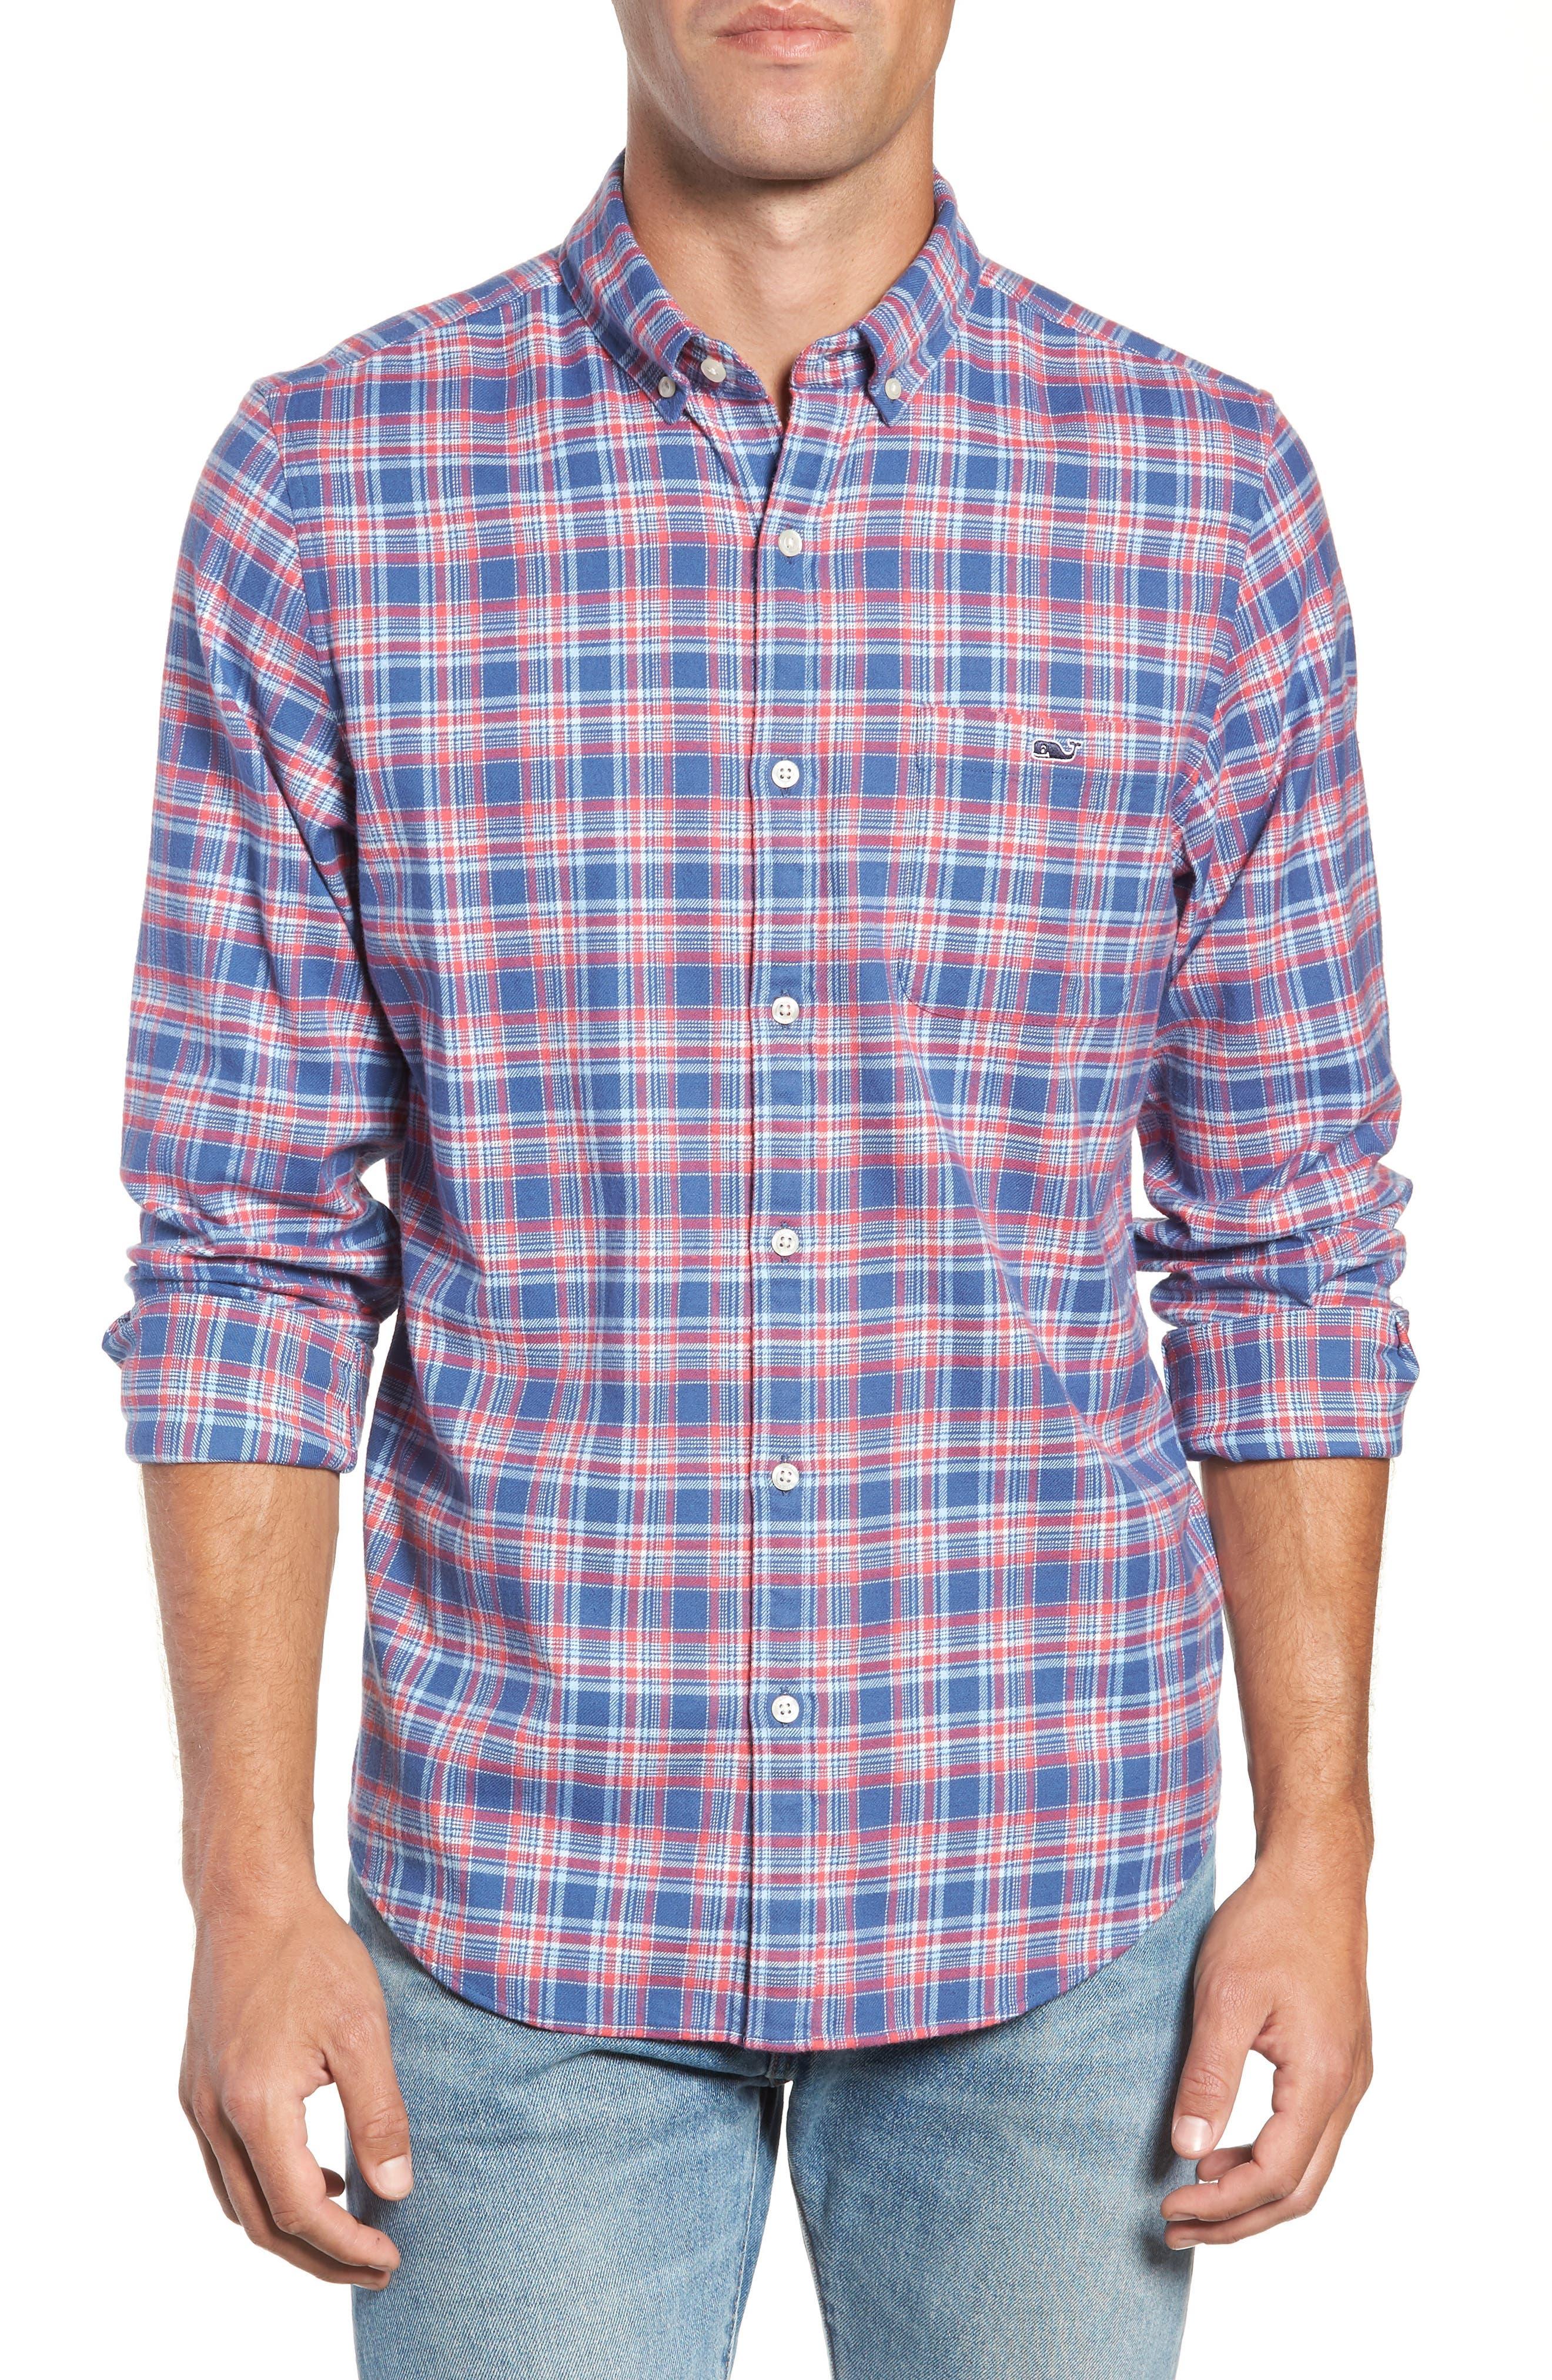 VINEYARD VINES,                             Lockwood Regular Fit Plaid Flannel Shirt,                             Main thumbnail 1, color,                             463